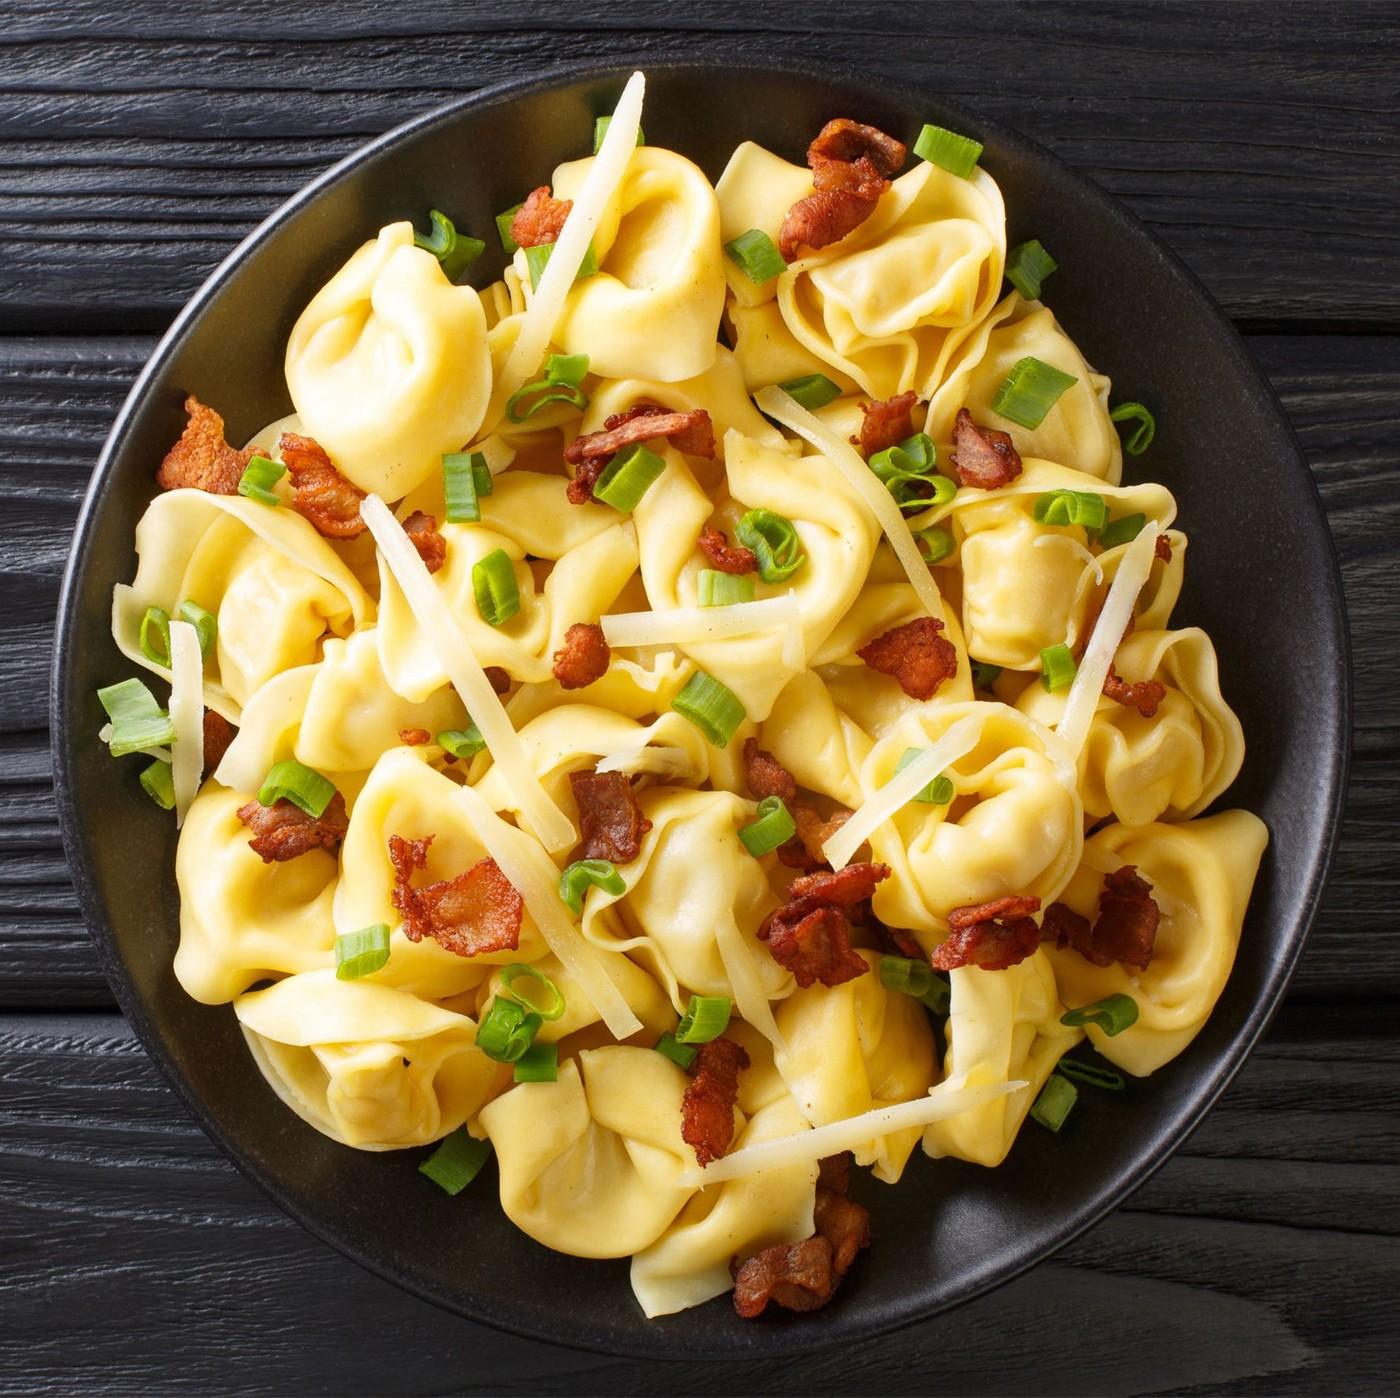 receta de Tortellini boloñesa con nata, jamón y piñones